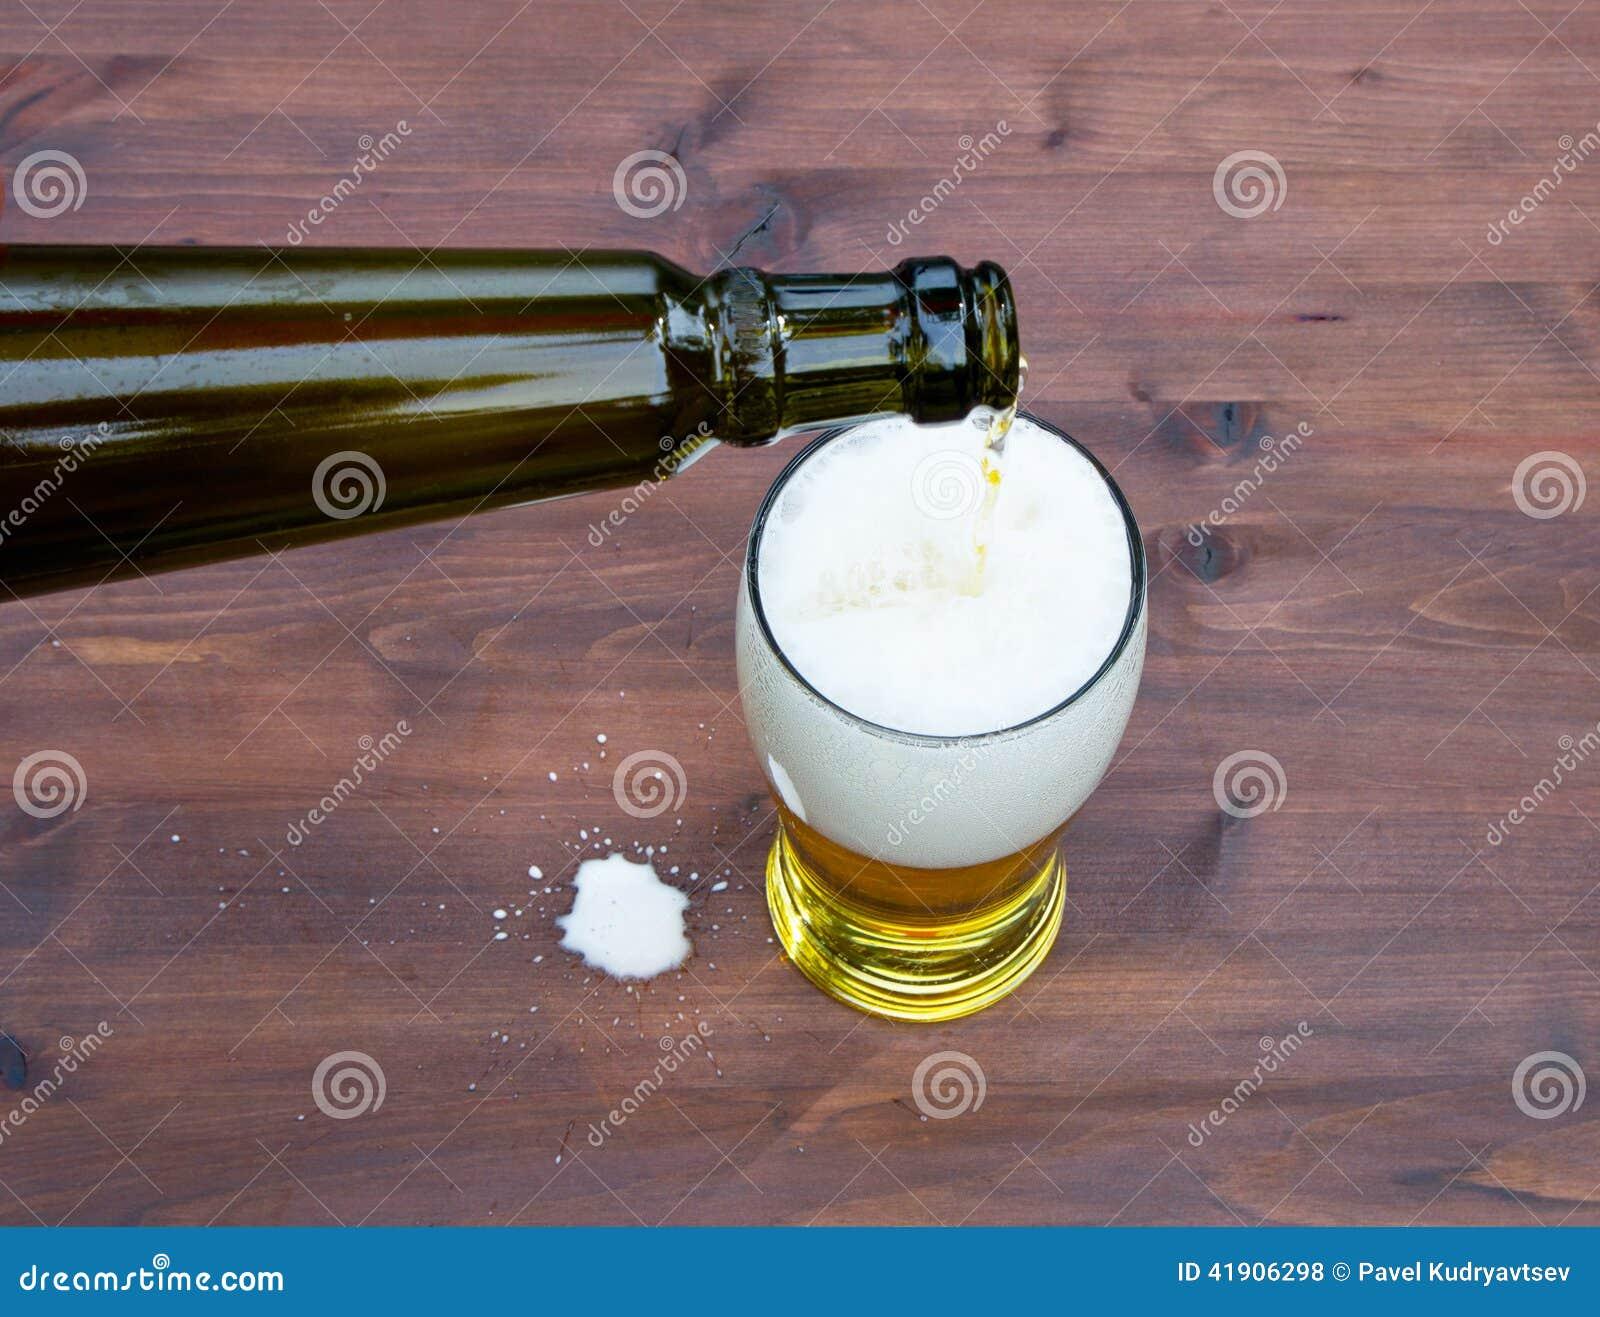 Colada de un vidrio de cerveza